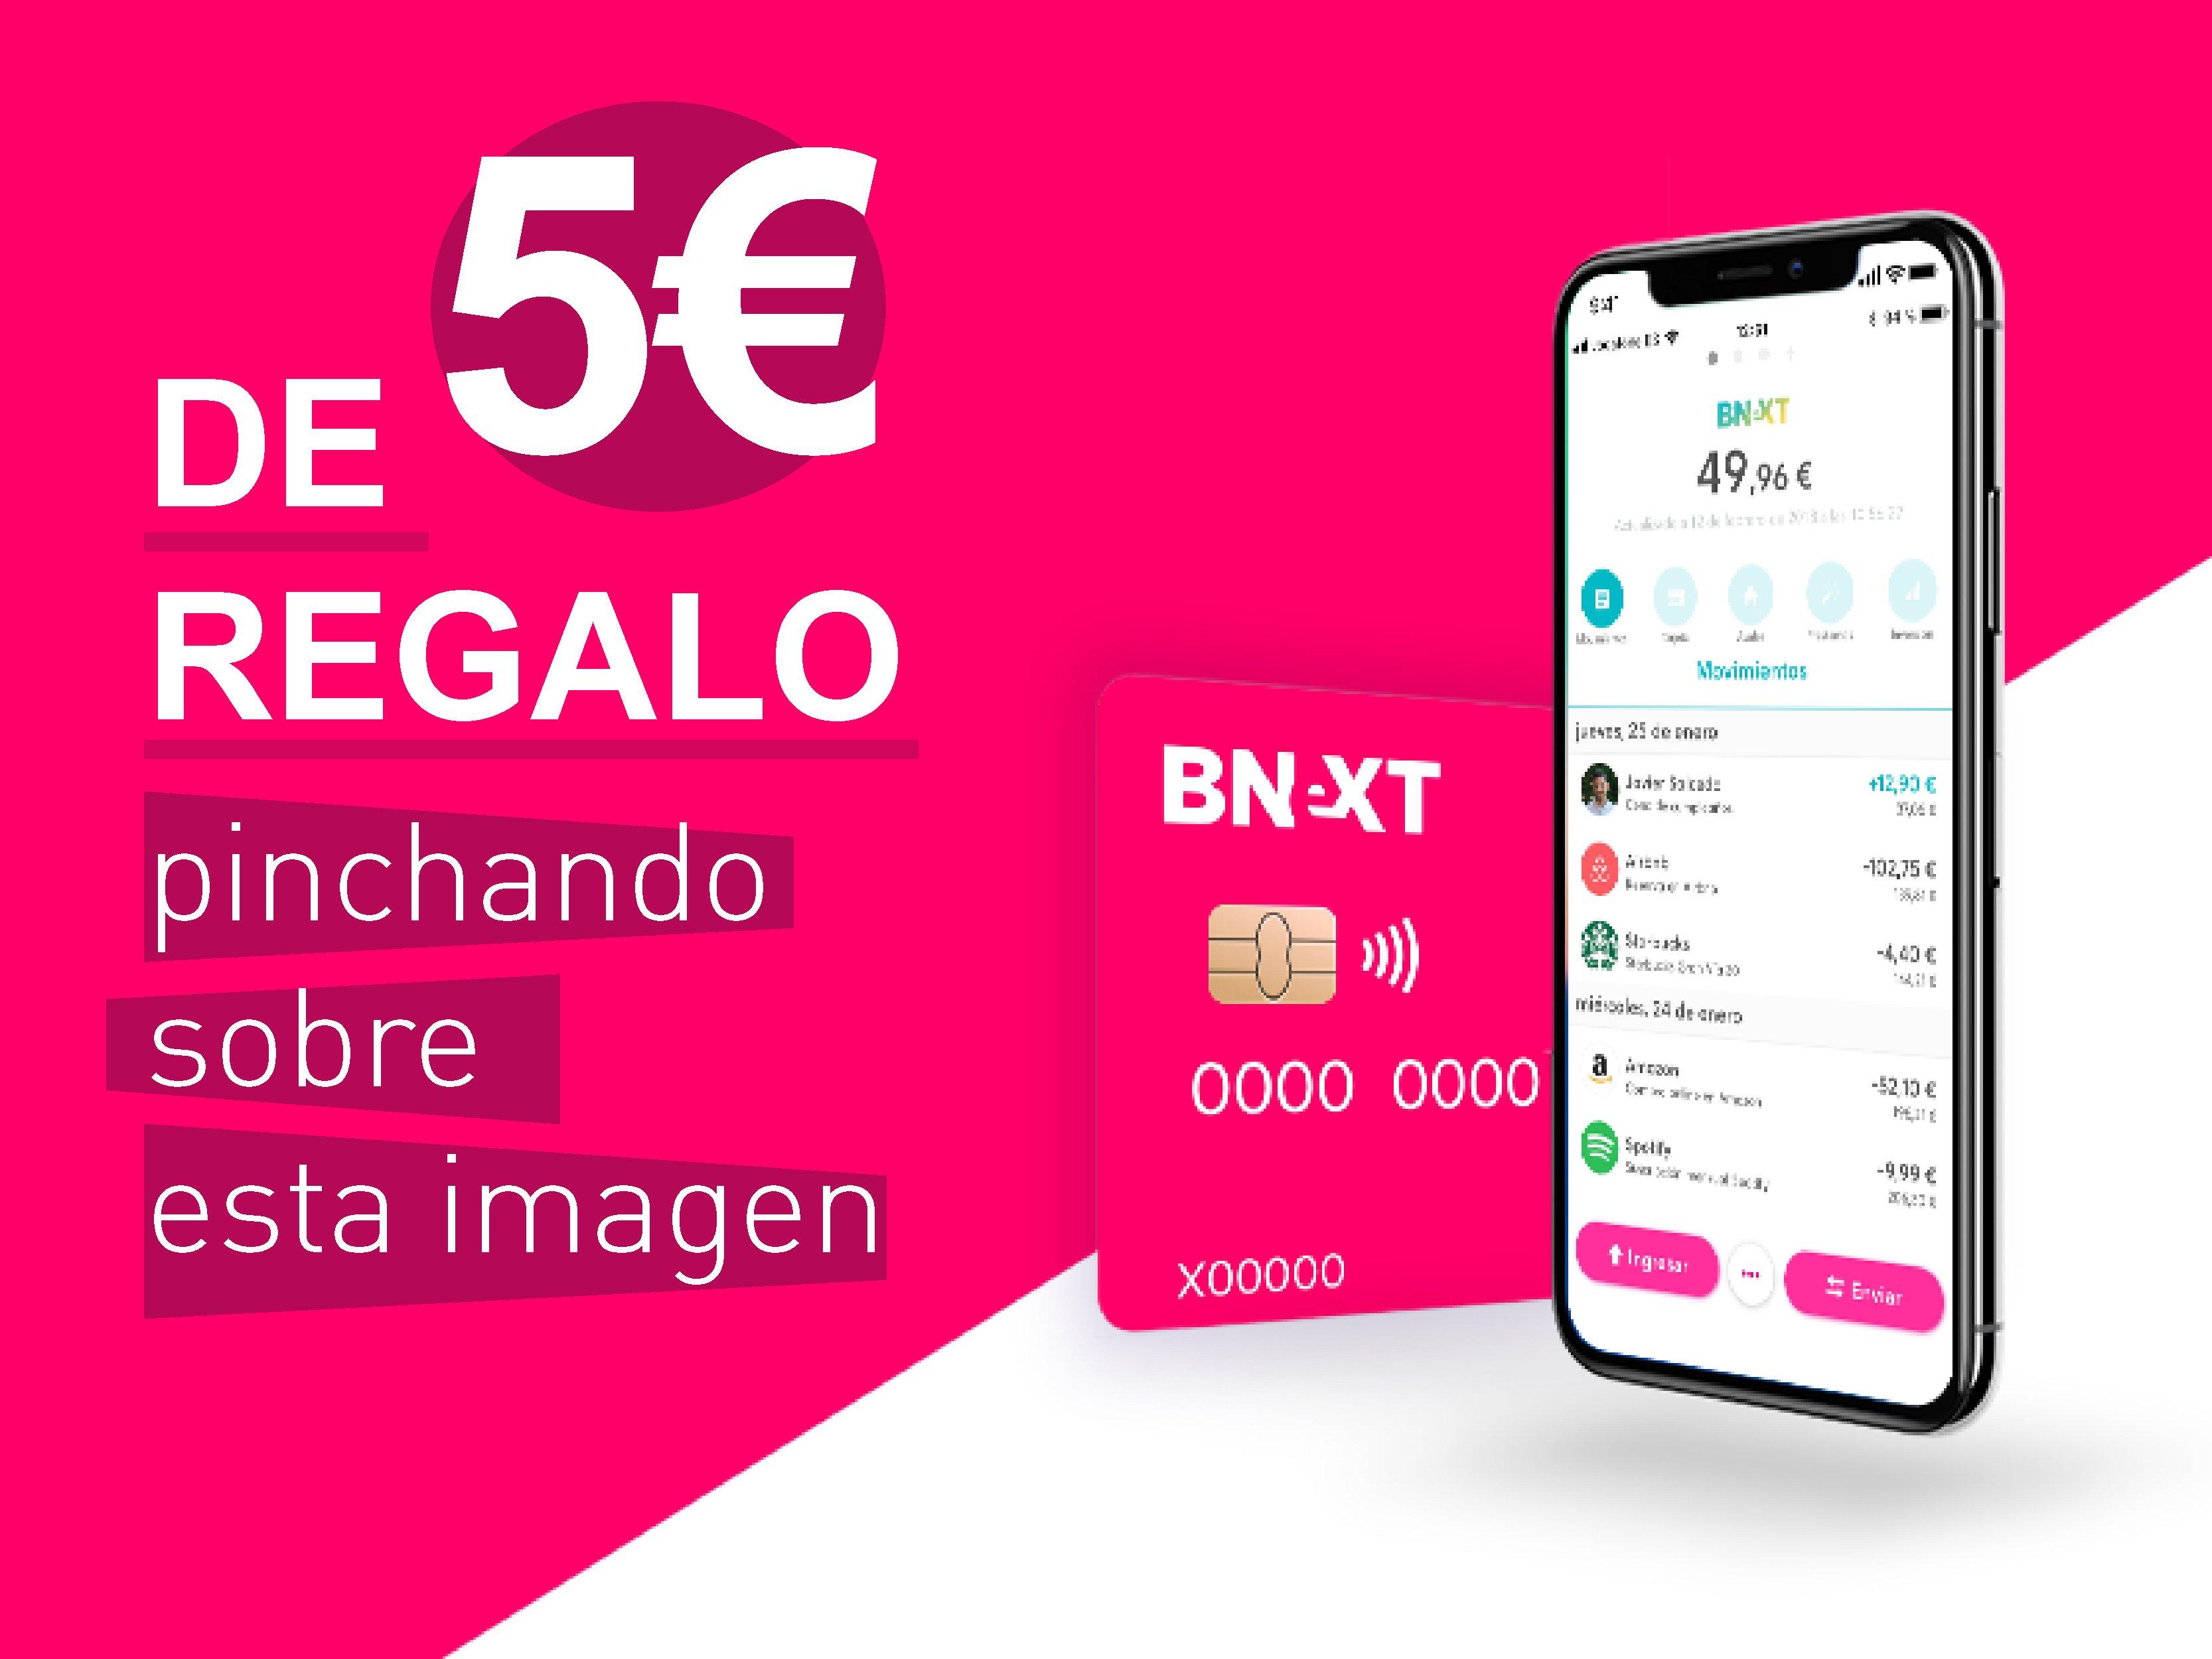 Tarjeta Bnext, 5 euros de regalo al registrarse